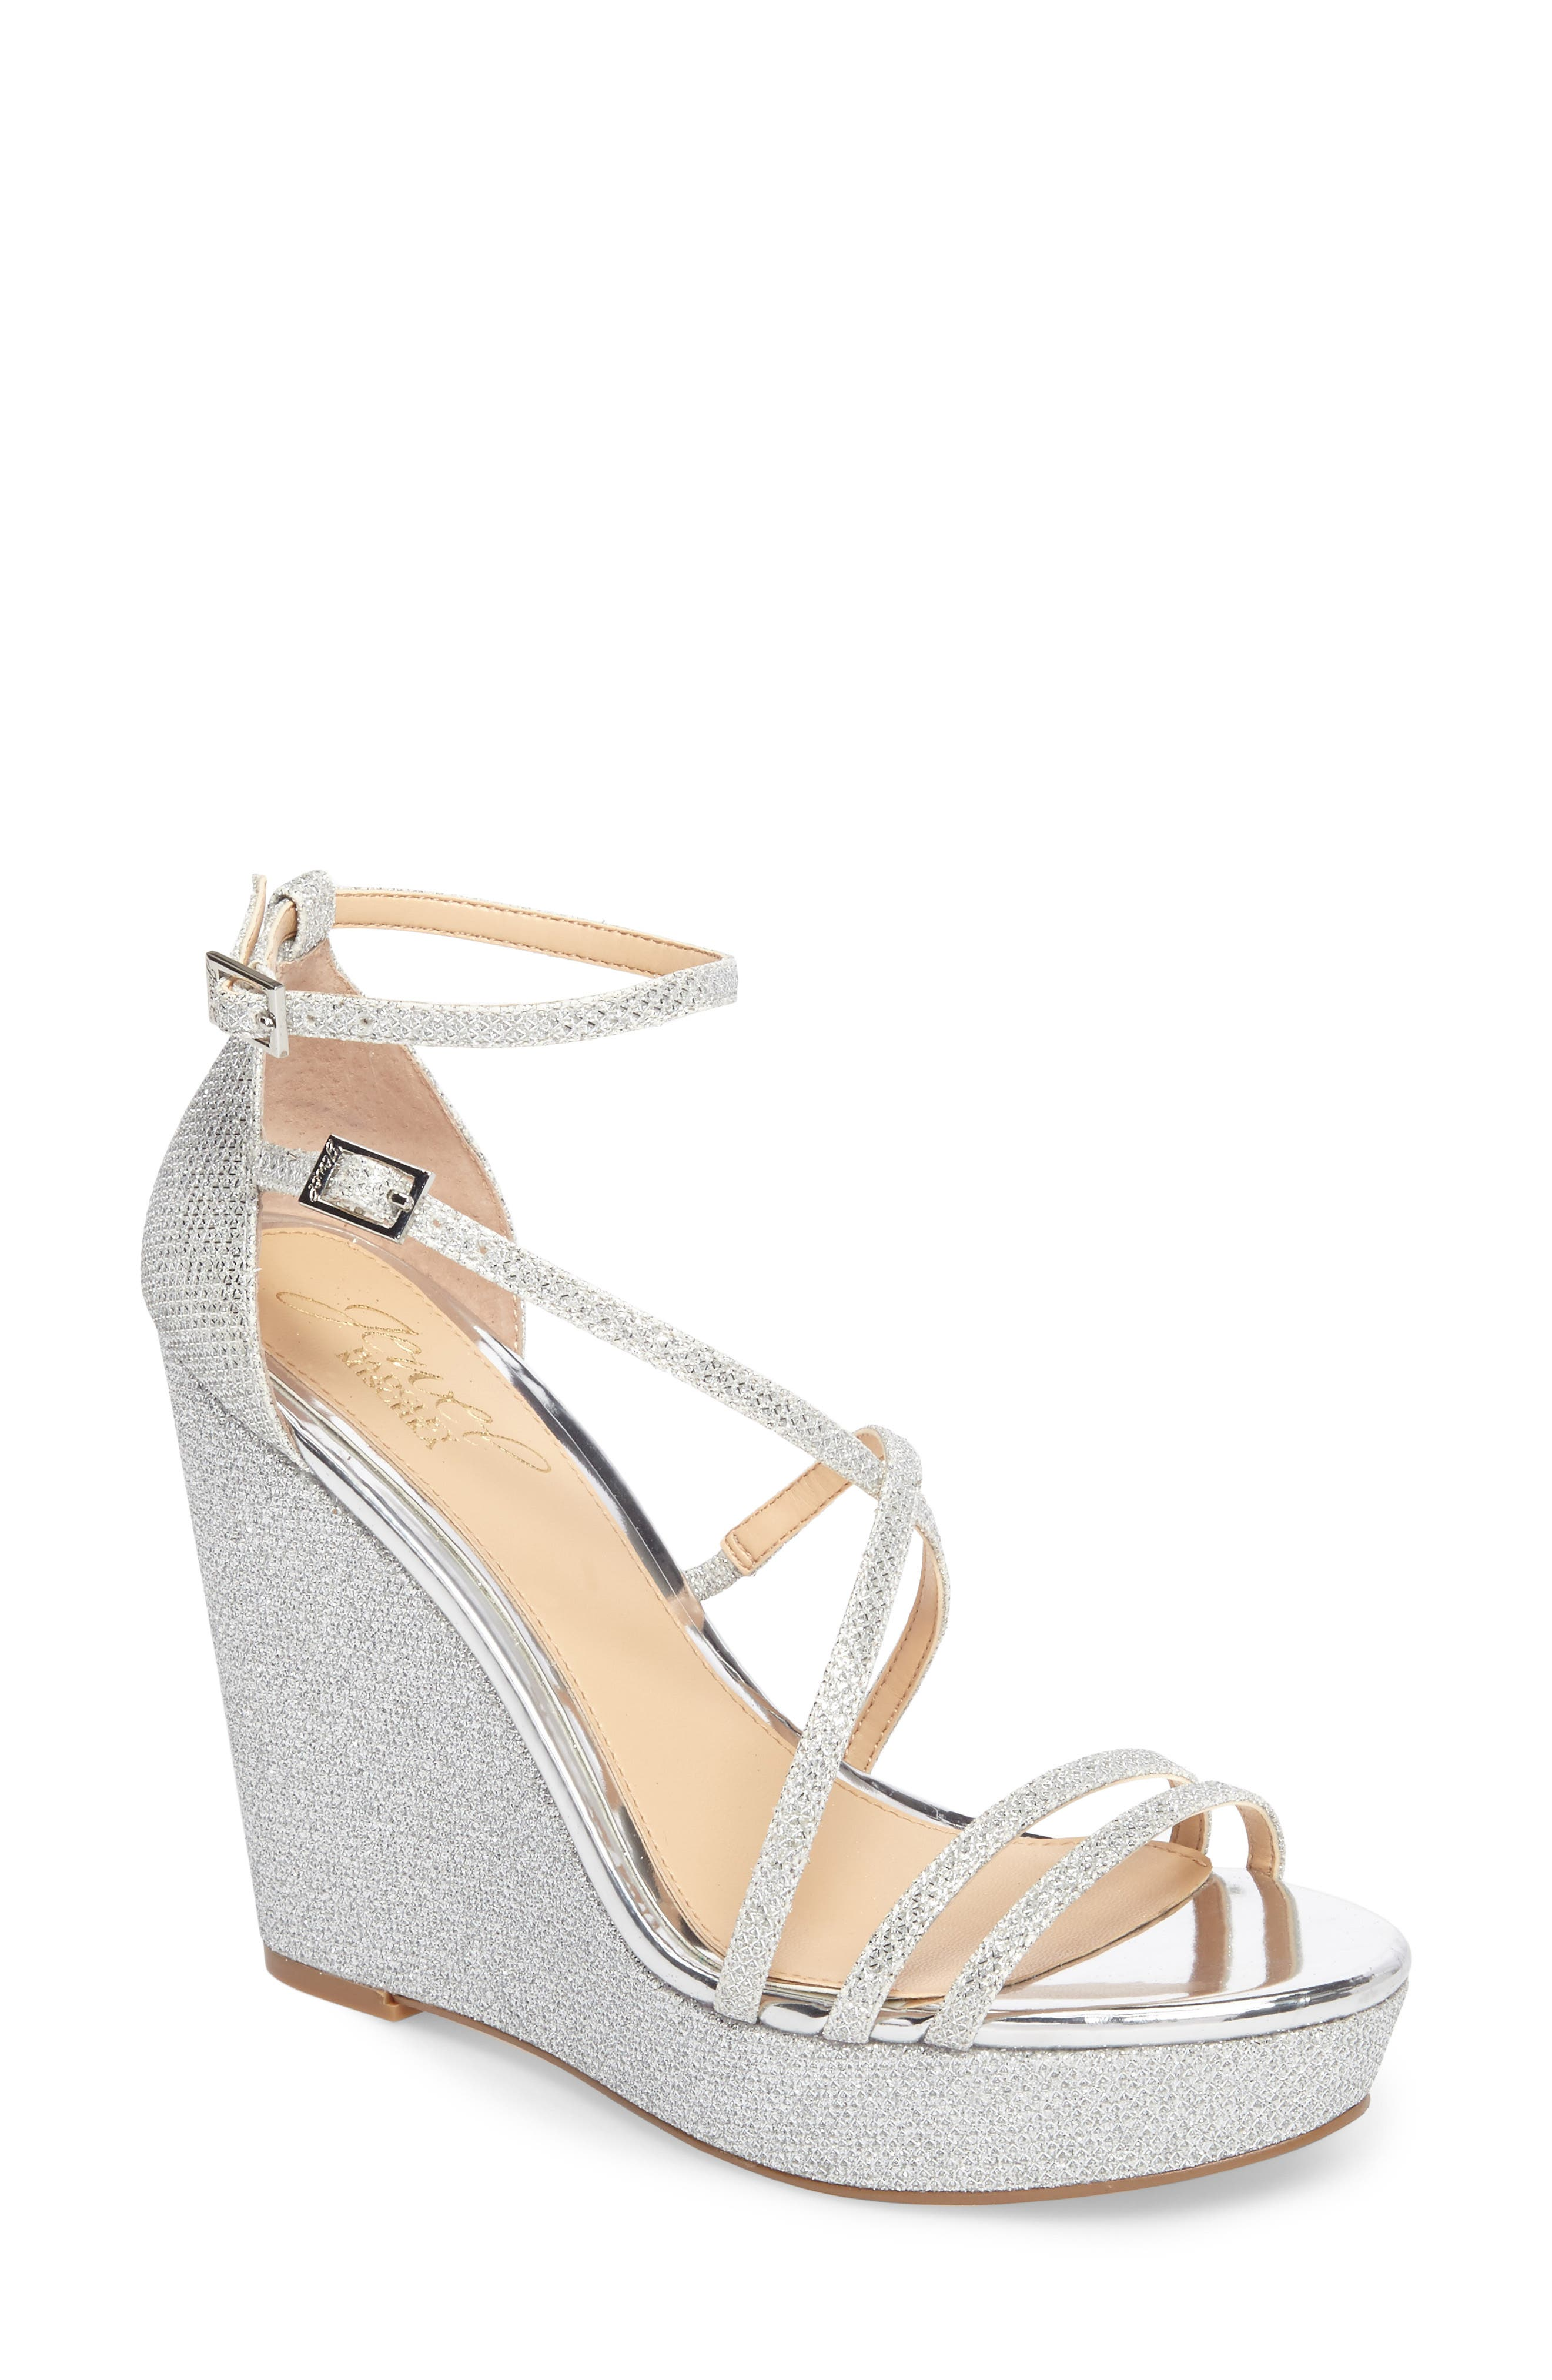 Jewel Badgley Mischka Tatsu Wedge Sandal (Women)